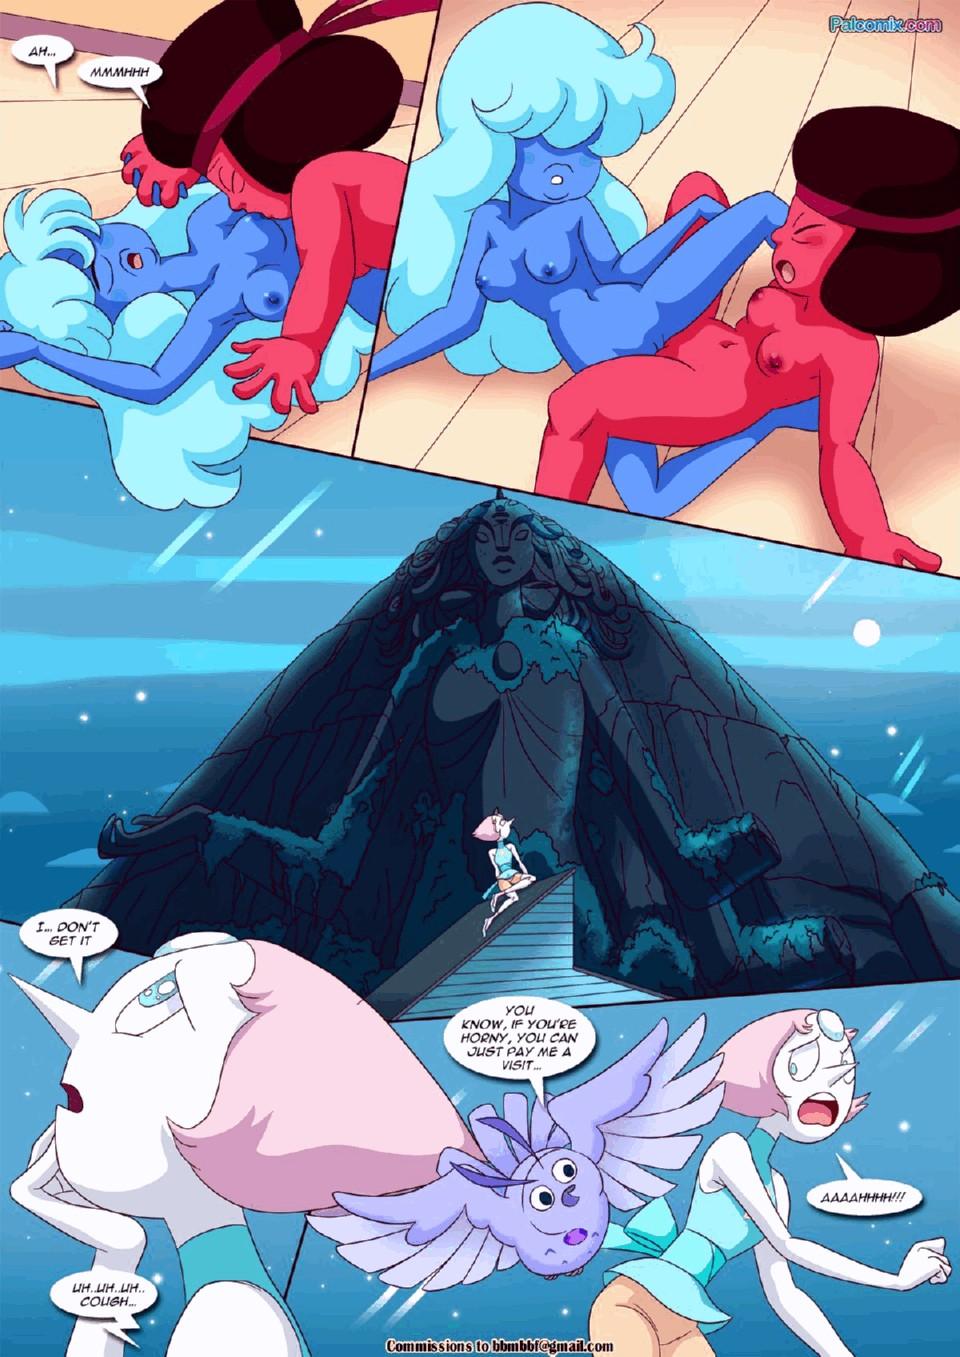 Rose's memories porn comic page 009